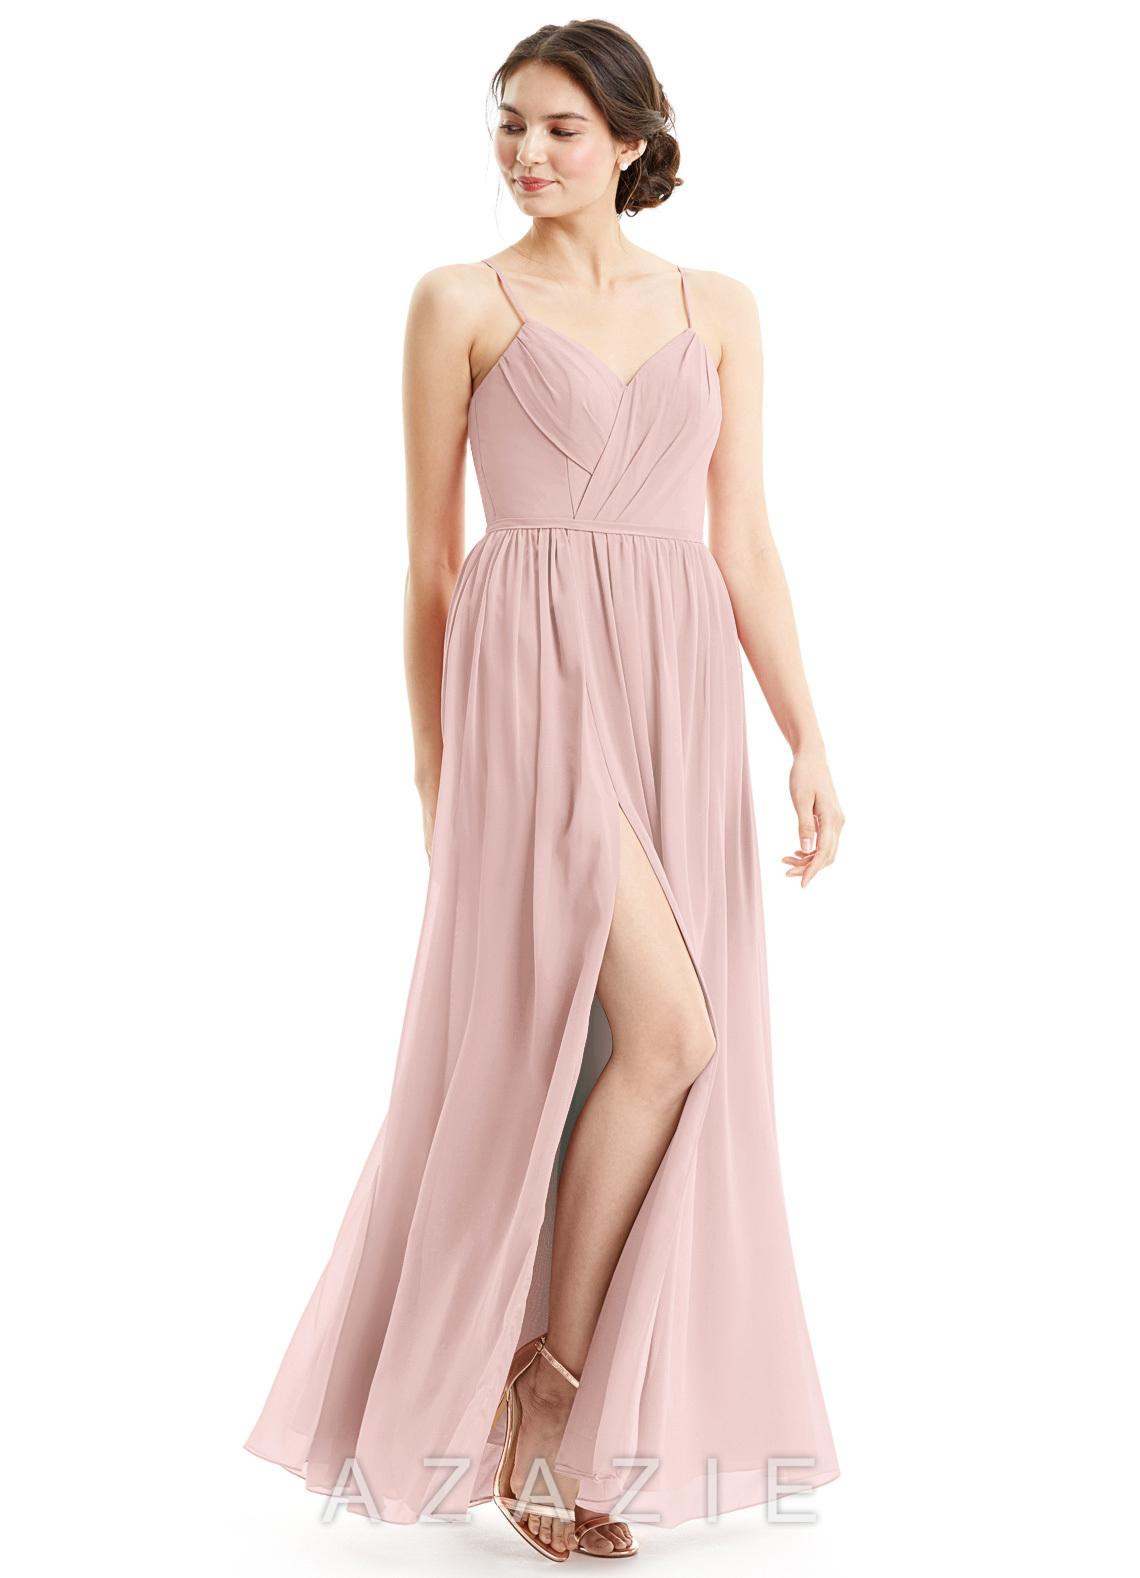 5719fdf30d2 Azazie Cora Bridesmaid Dress - Dusty Rose